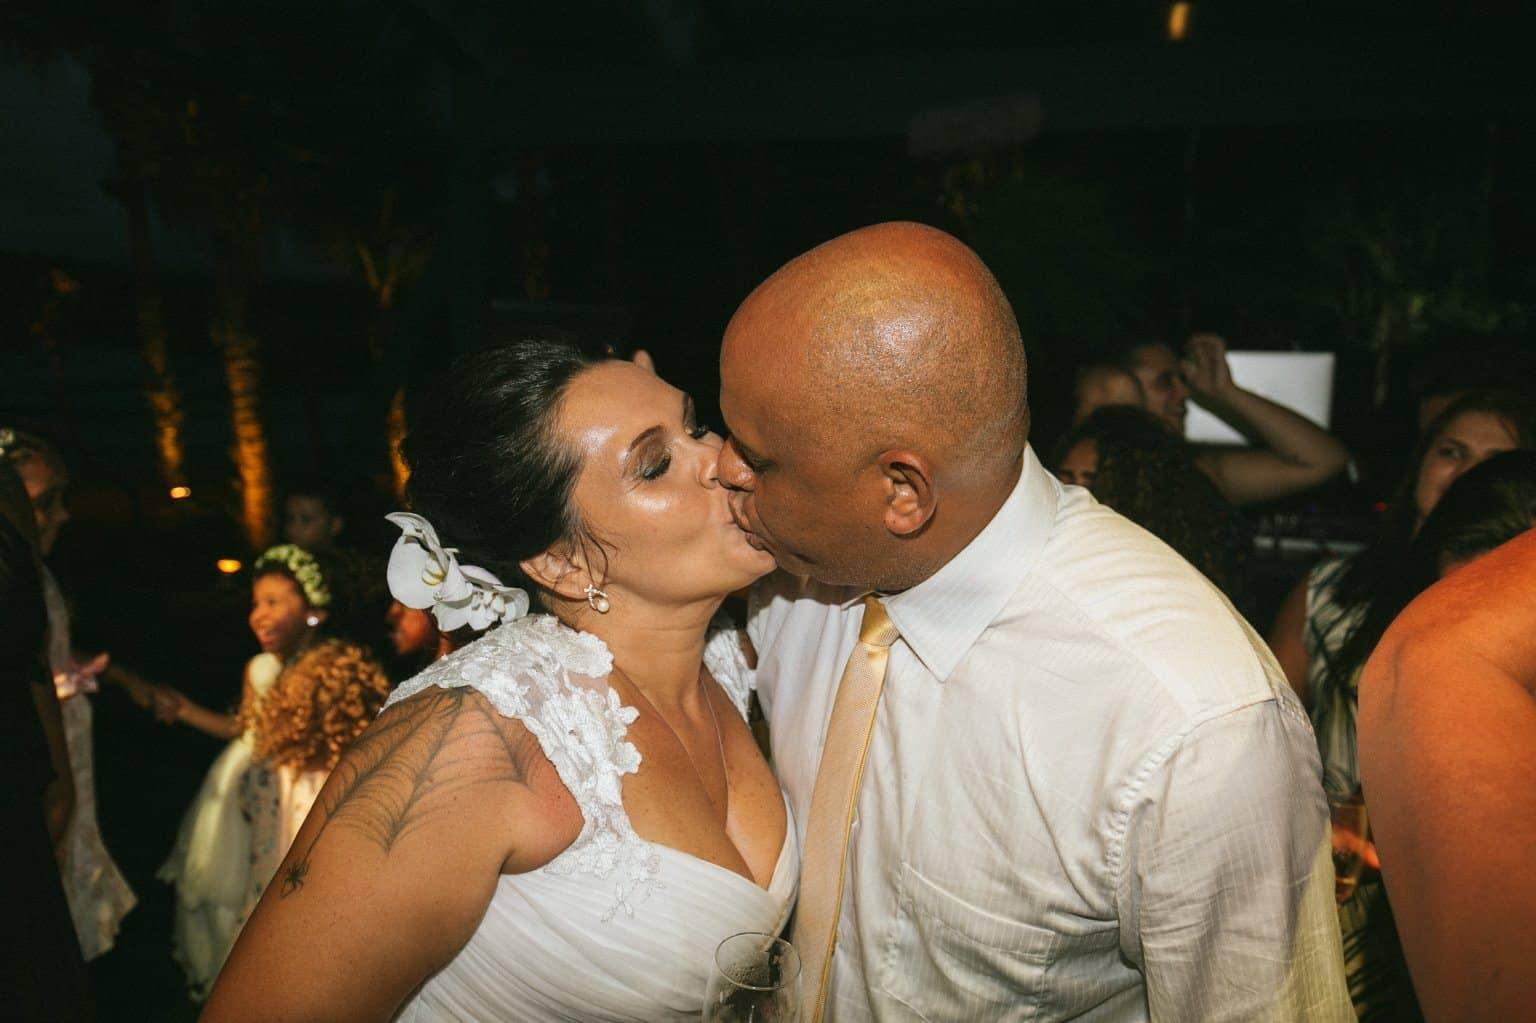 casamento-karina-e-marcos-felizes-para-sempre-caseme-17